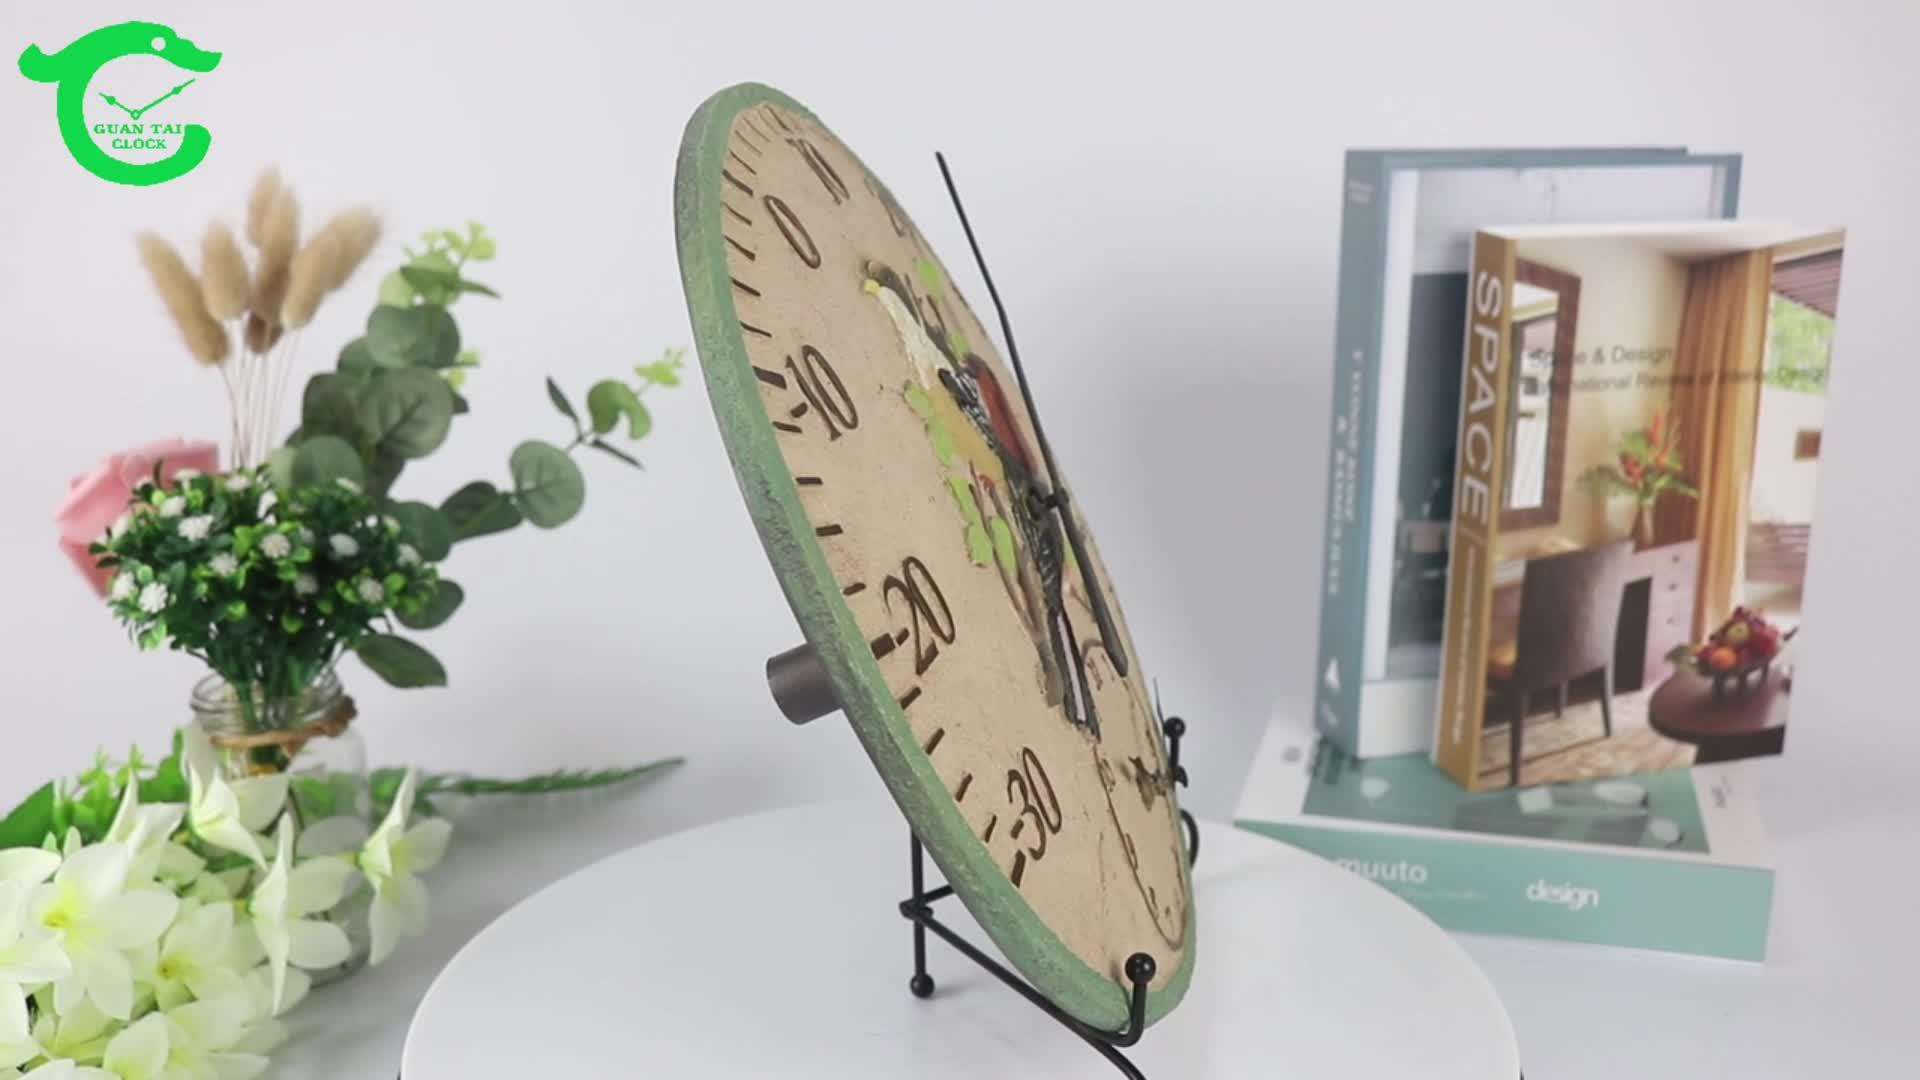 OEM art rustic นาฬิกา cuckoo สำหรับกลางแจ้ง